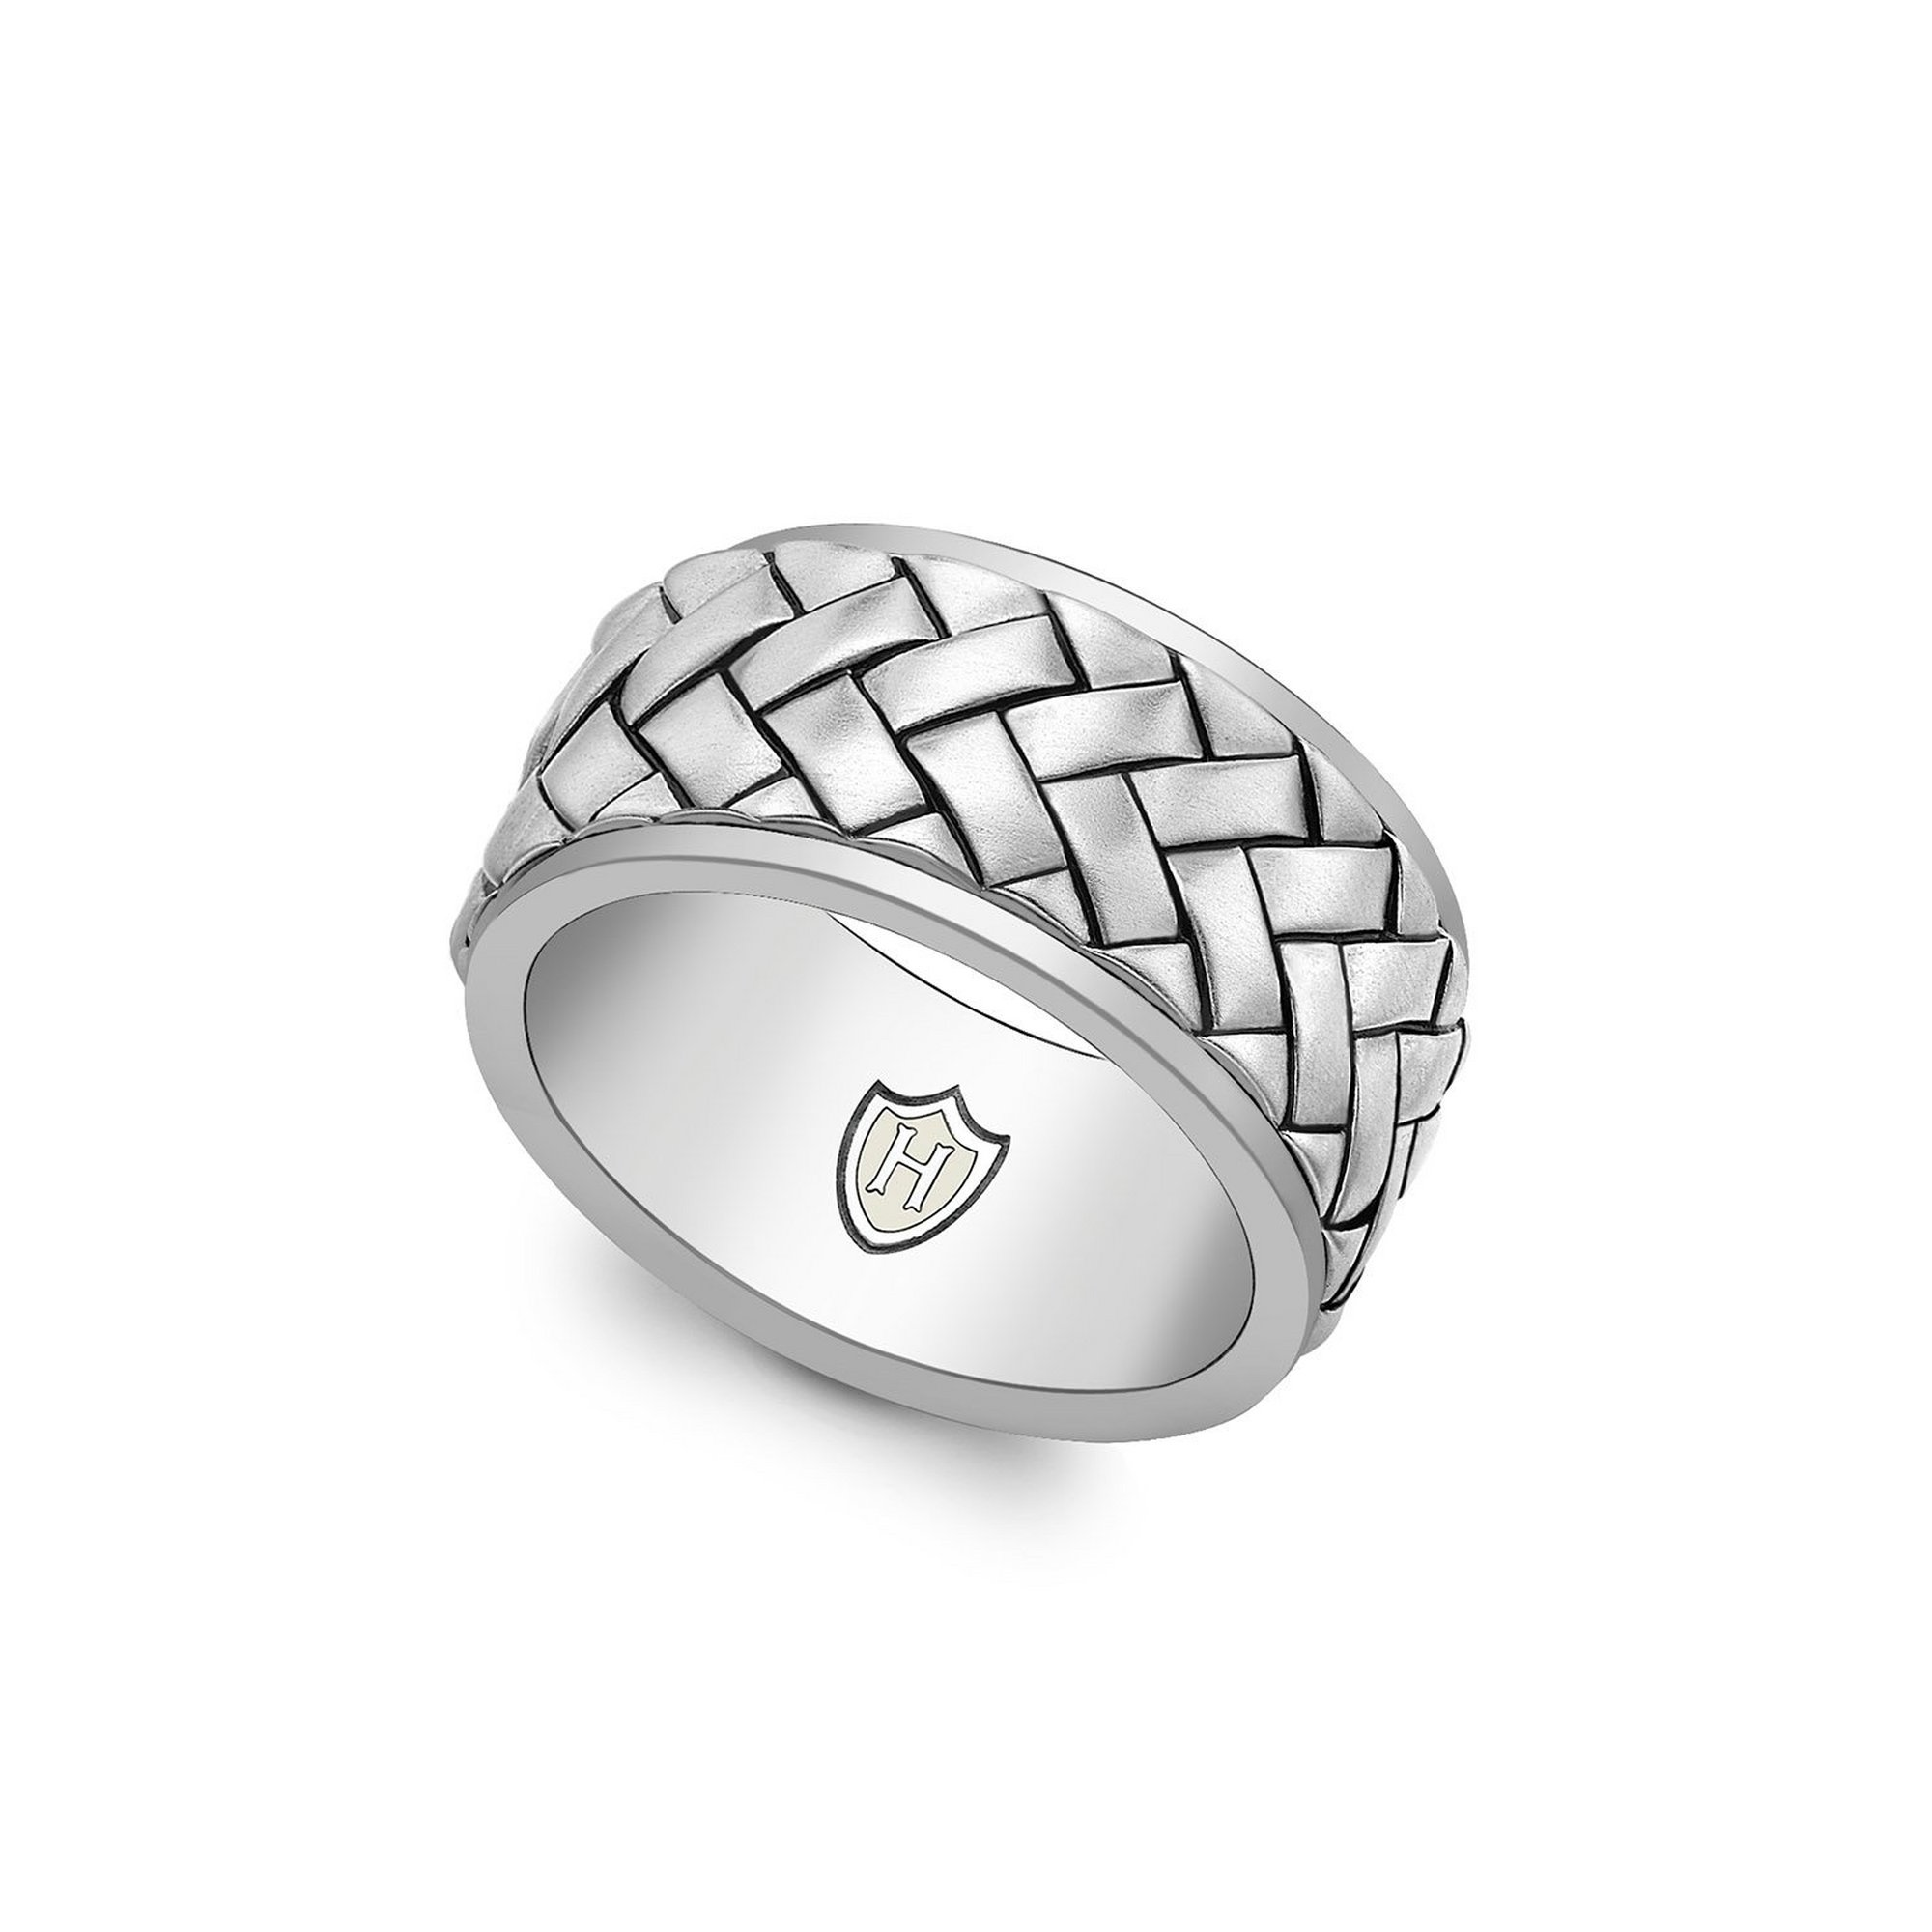 Image of Hoxton London Herringbone Ring